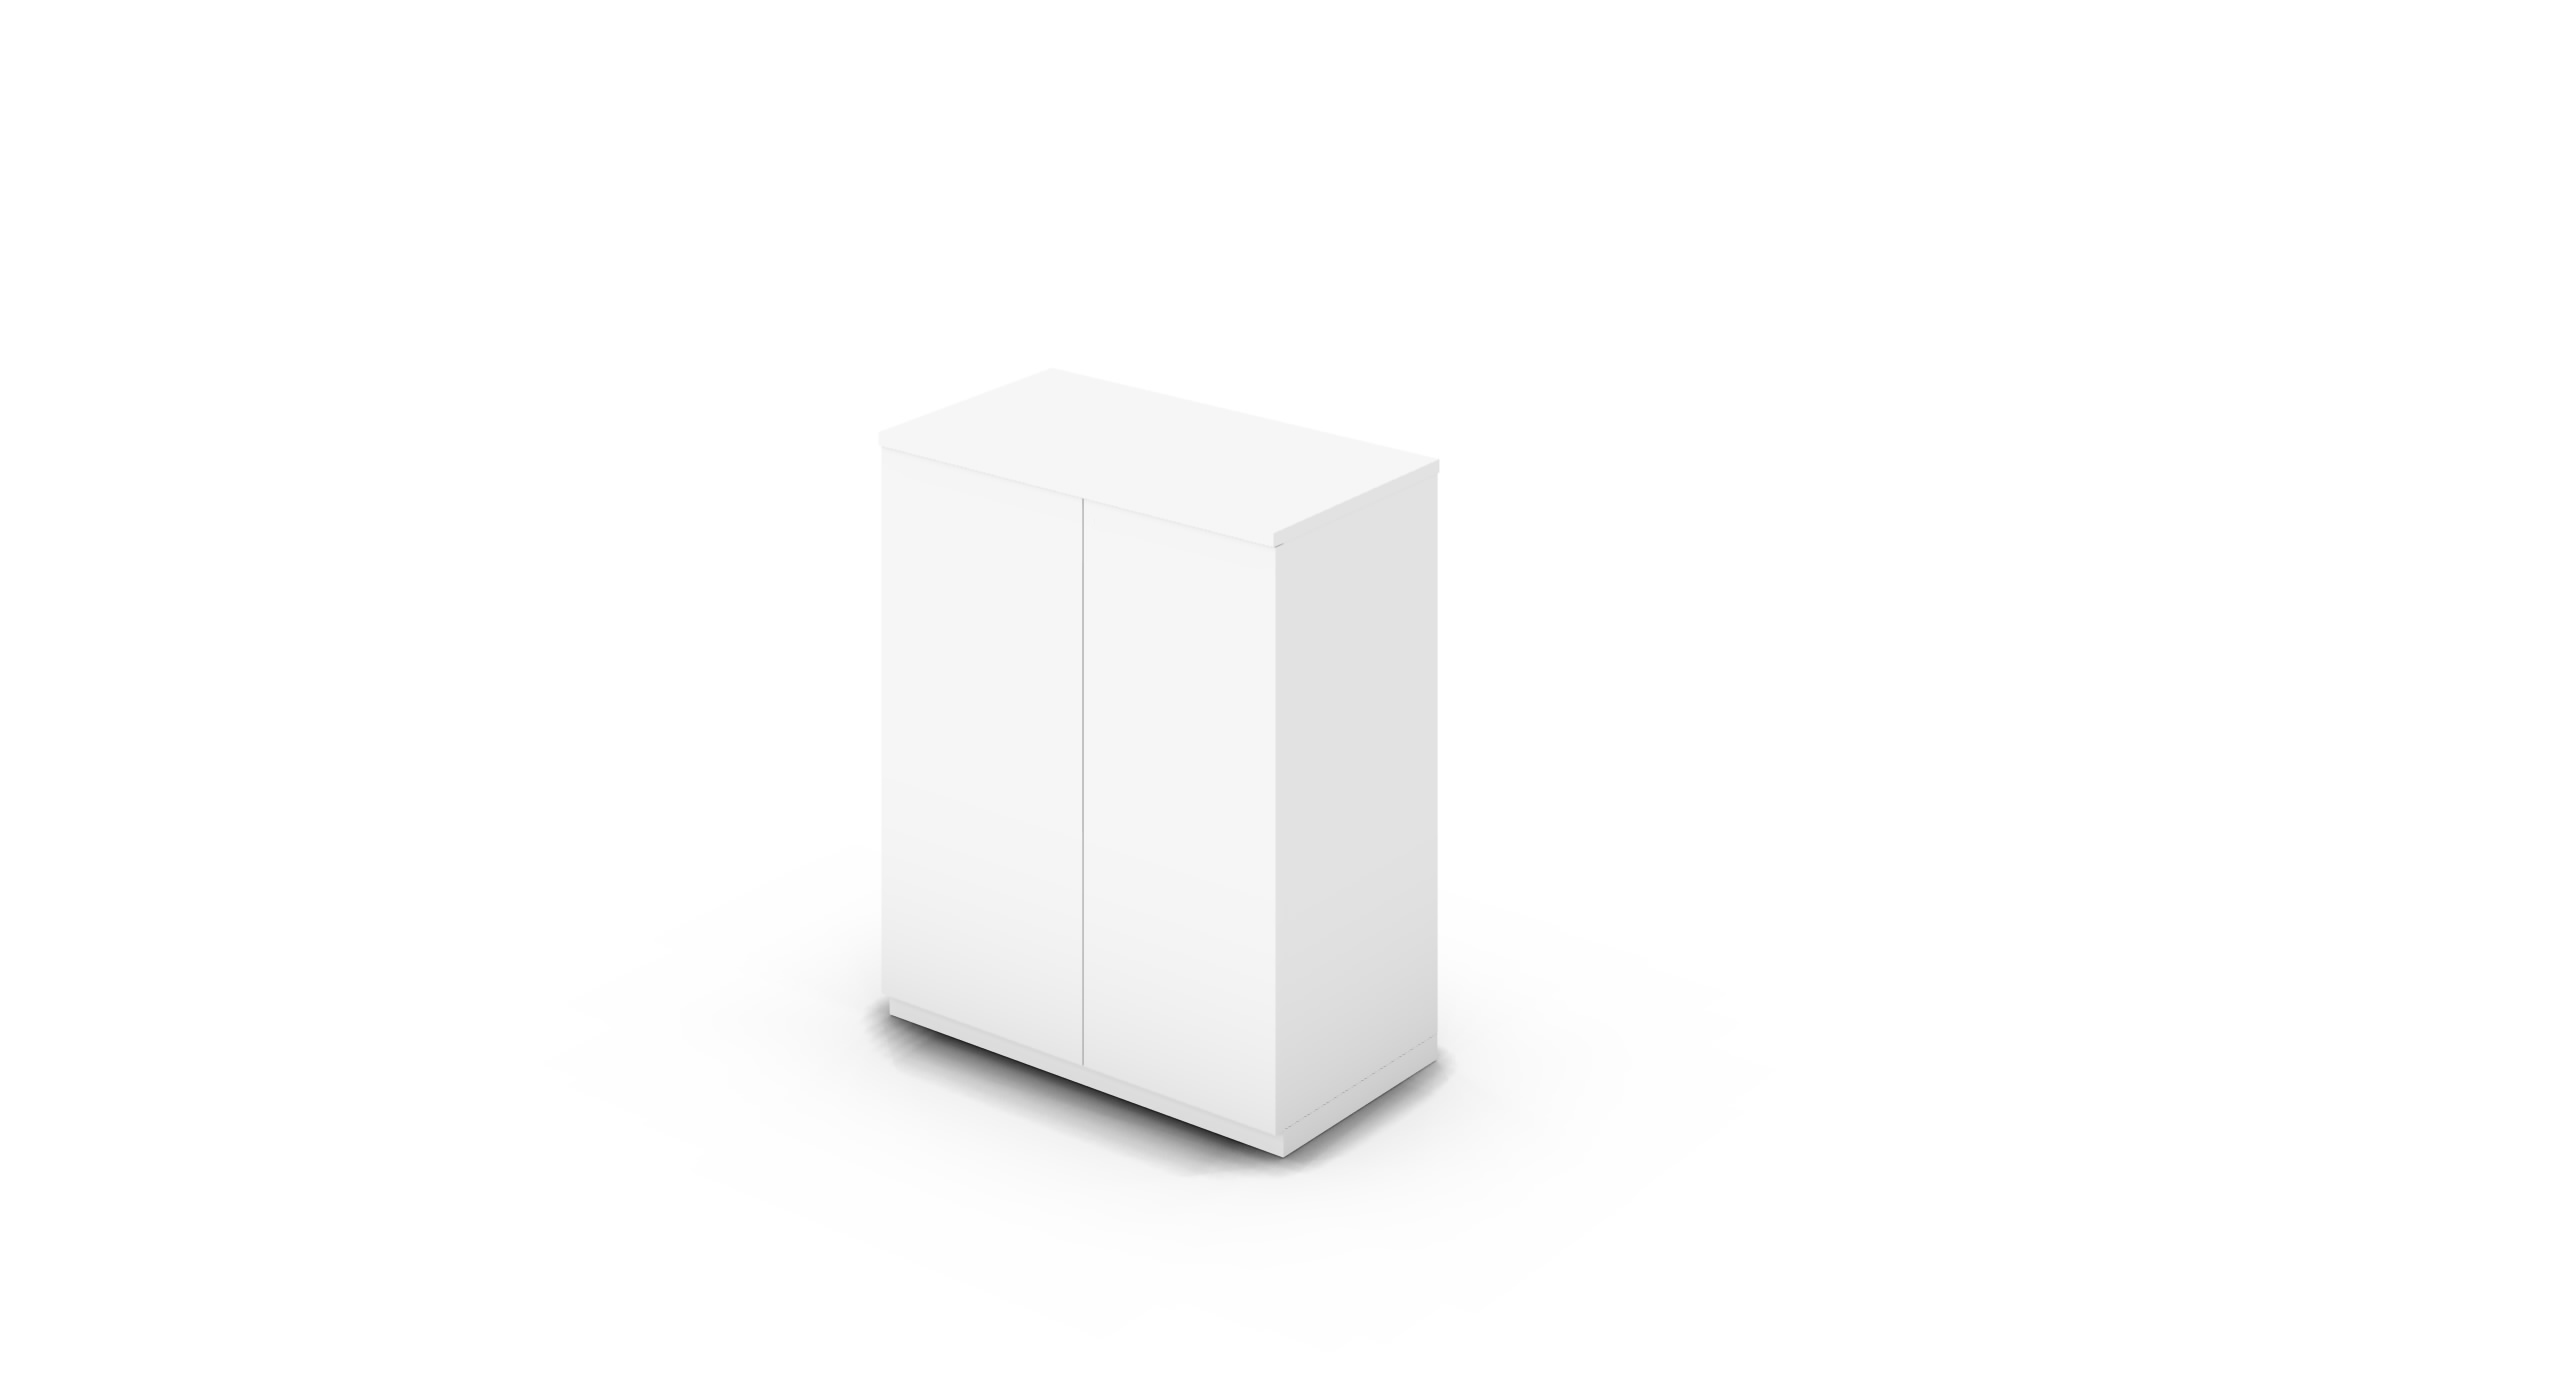 Cabinet_800x450x1125_HD_White_Push_NoCylinder